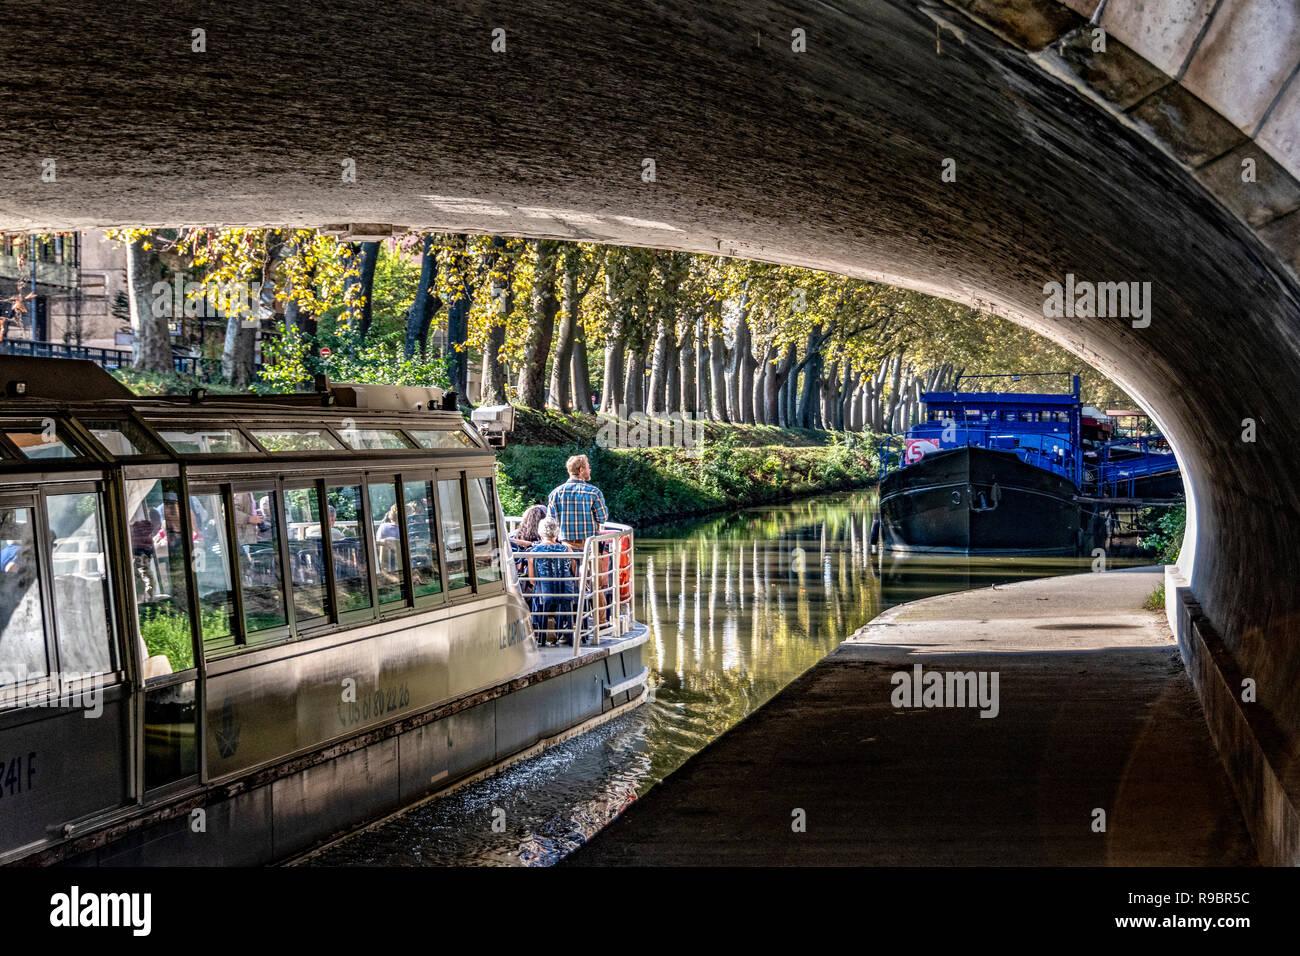 France. Haute-Garonne (31), Toulouse. Houseboats on the Canal du Midi Stock Photo